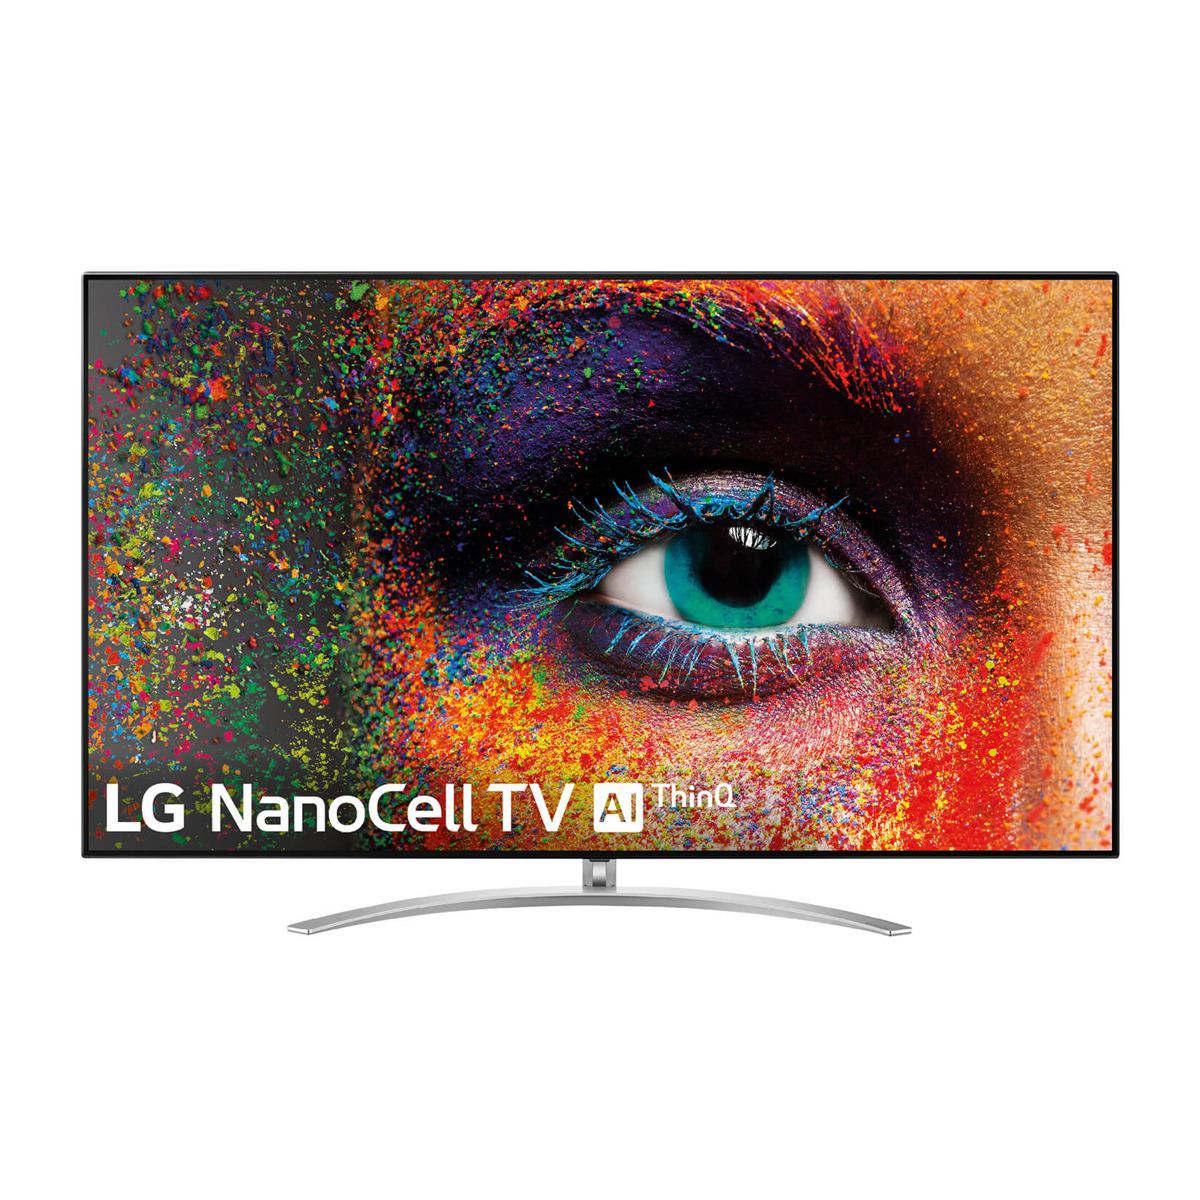 "TV LED 139 cm (55"") LG 55SM9800 NanoCell 4K, HDR Smart TV con Inteligencia Artificial (IA)"